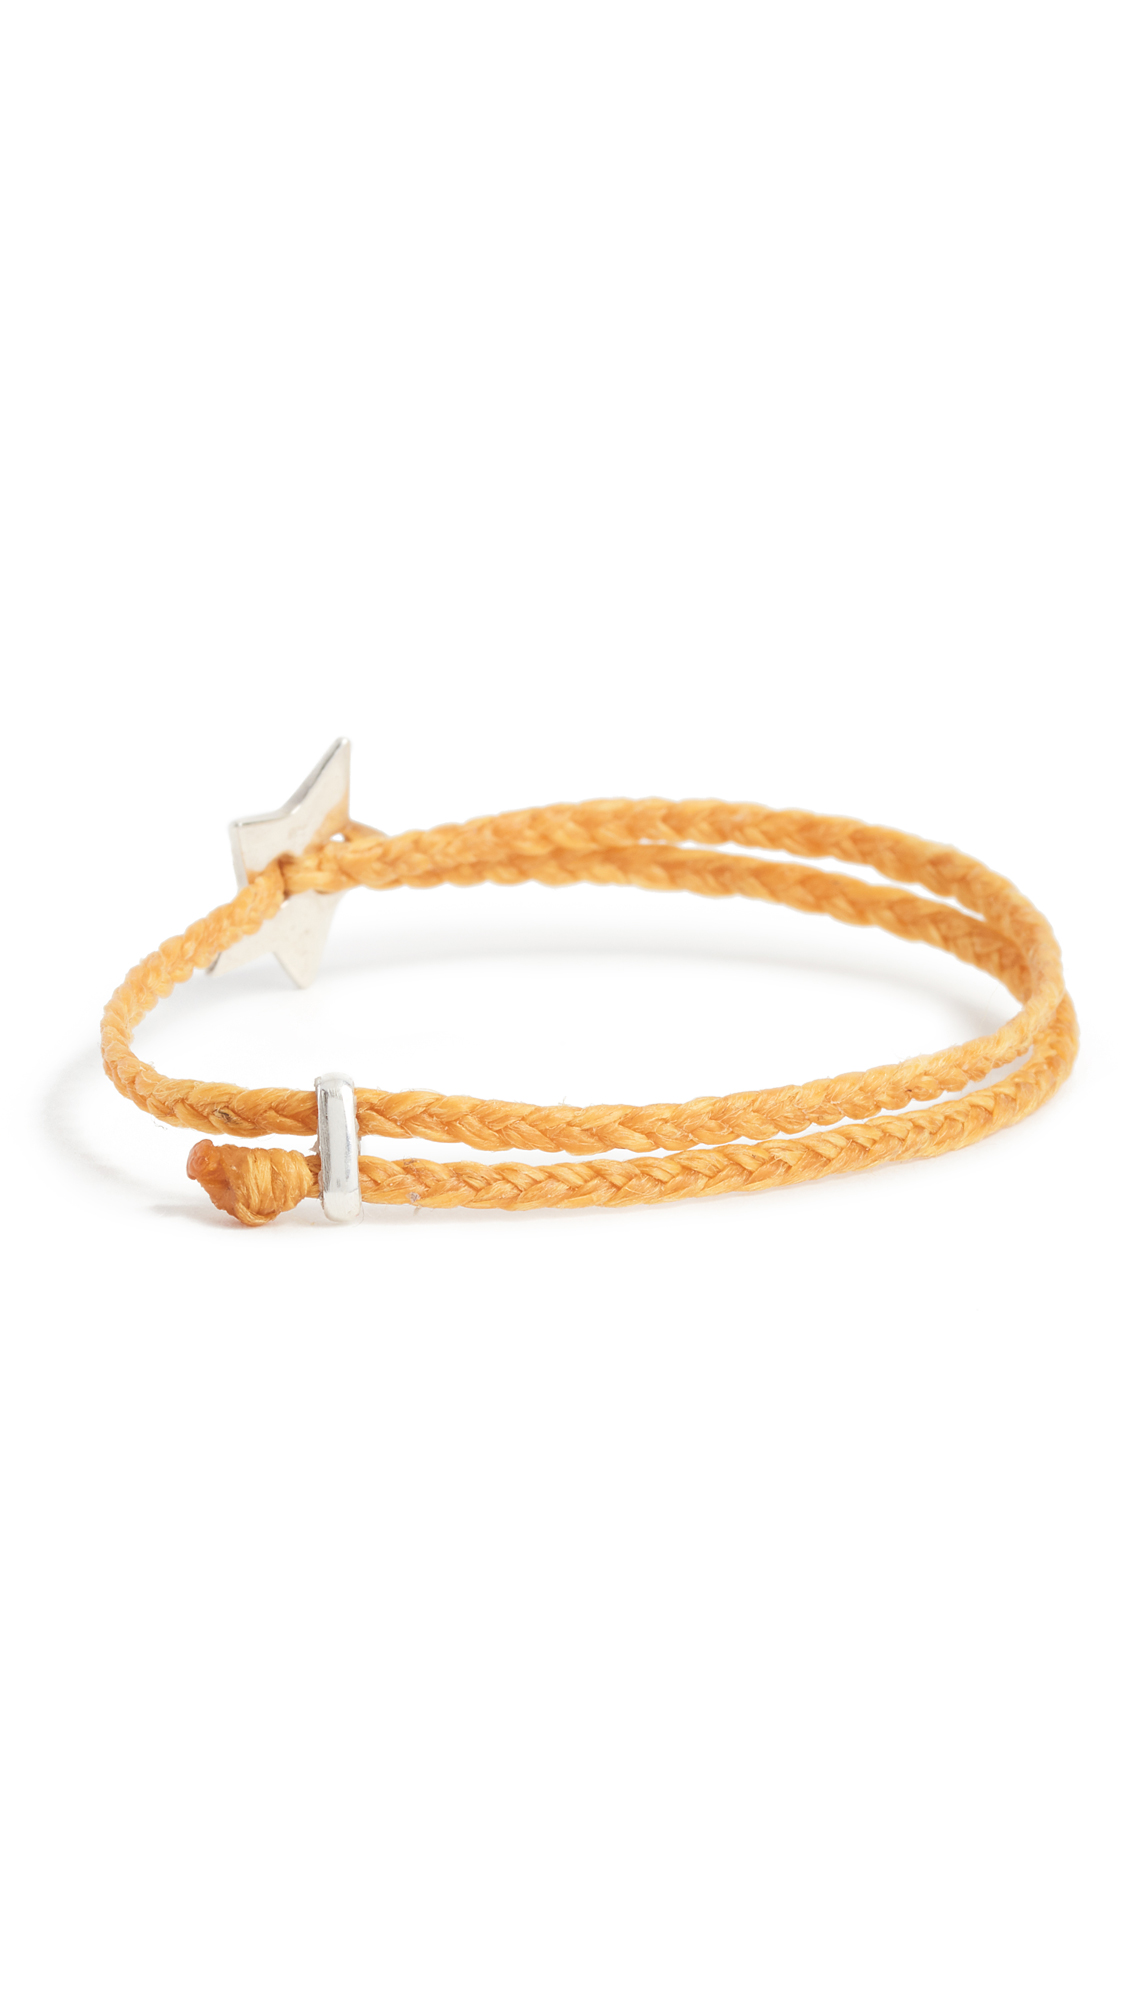 Scosha Signature Star Slider Bracelet - Mimosa 0SK1gPrfP